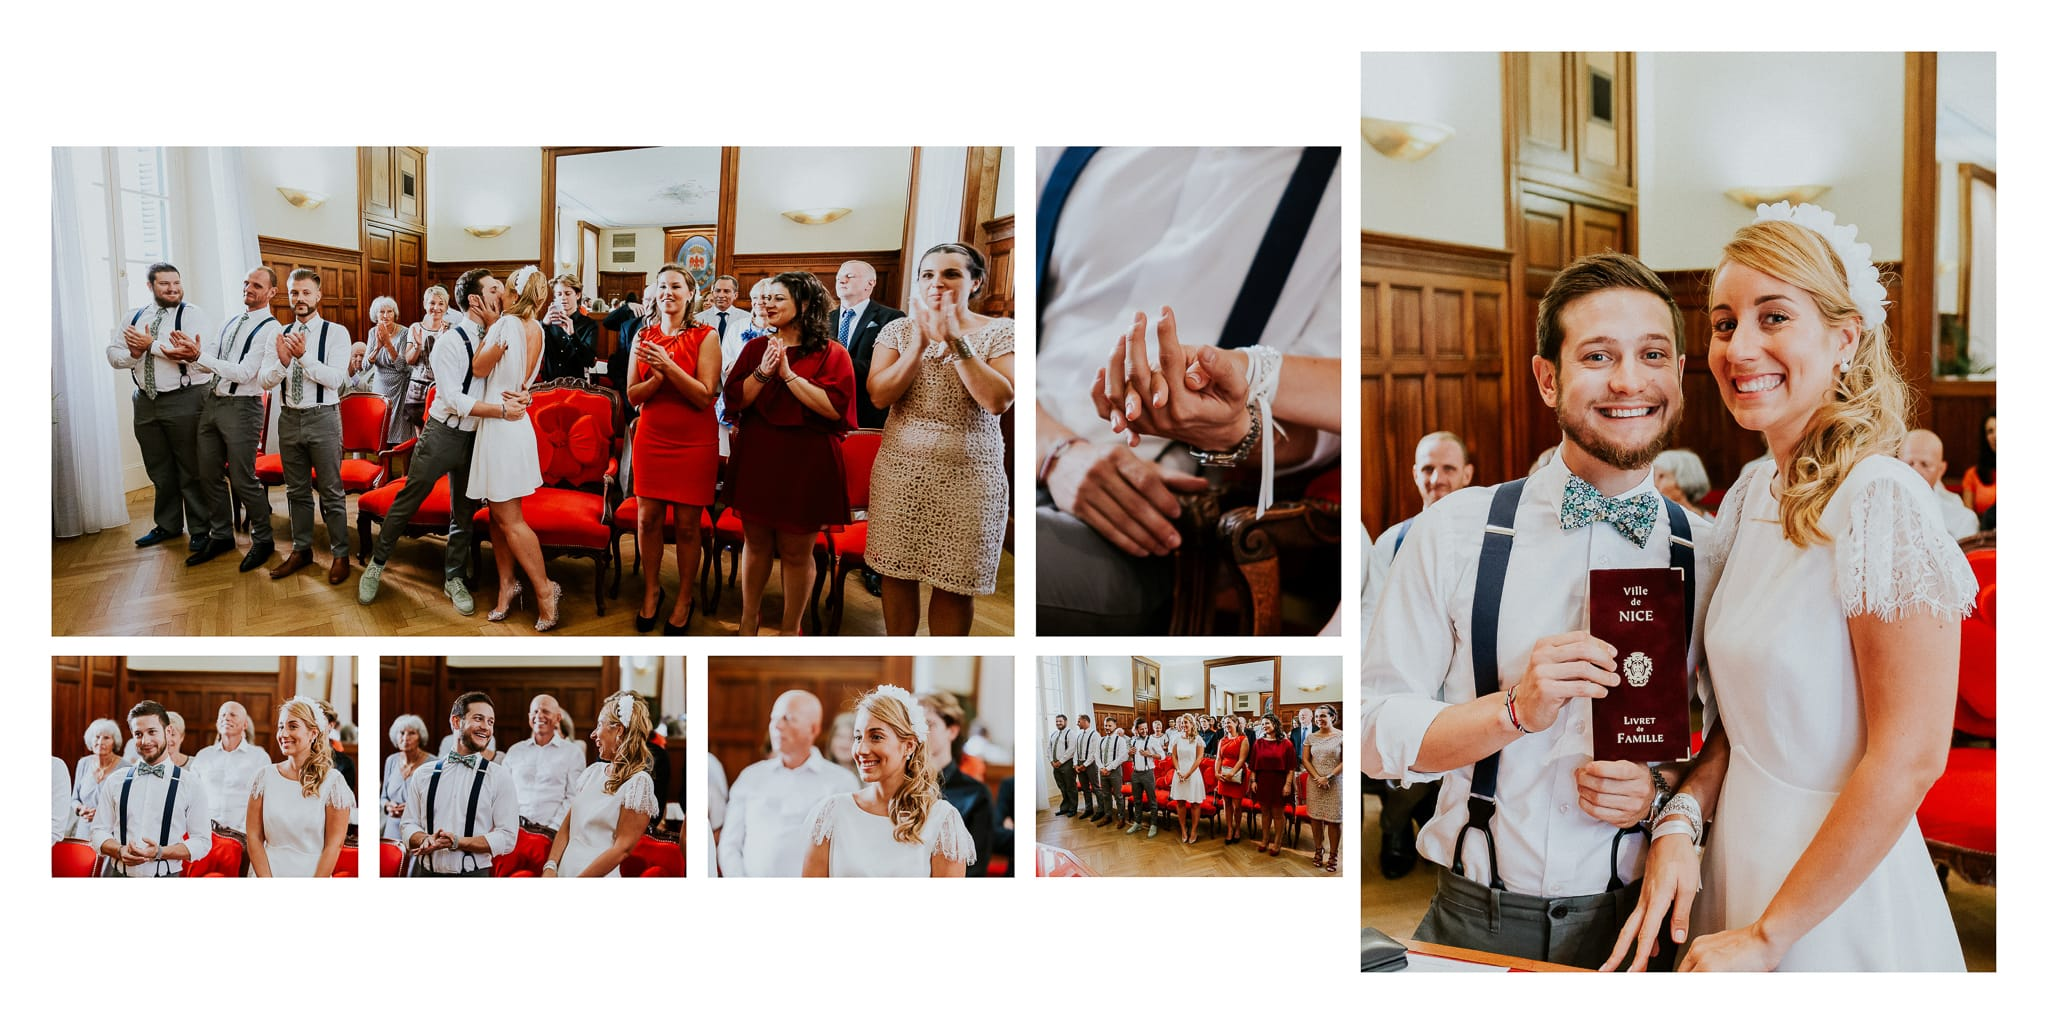 Costi-Moiceanu-Photographer-CM-Photography-Wedding-Mariage-French-Riviera-Cote-D-Azur-Alpes-Maritimes-Weding-Album-Design-1